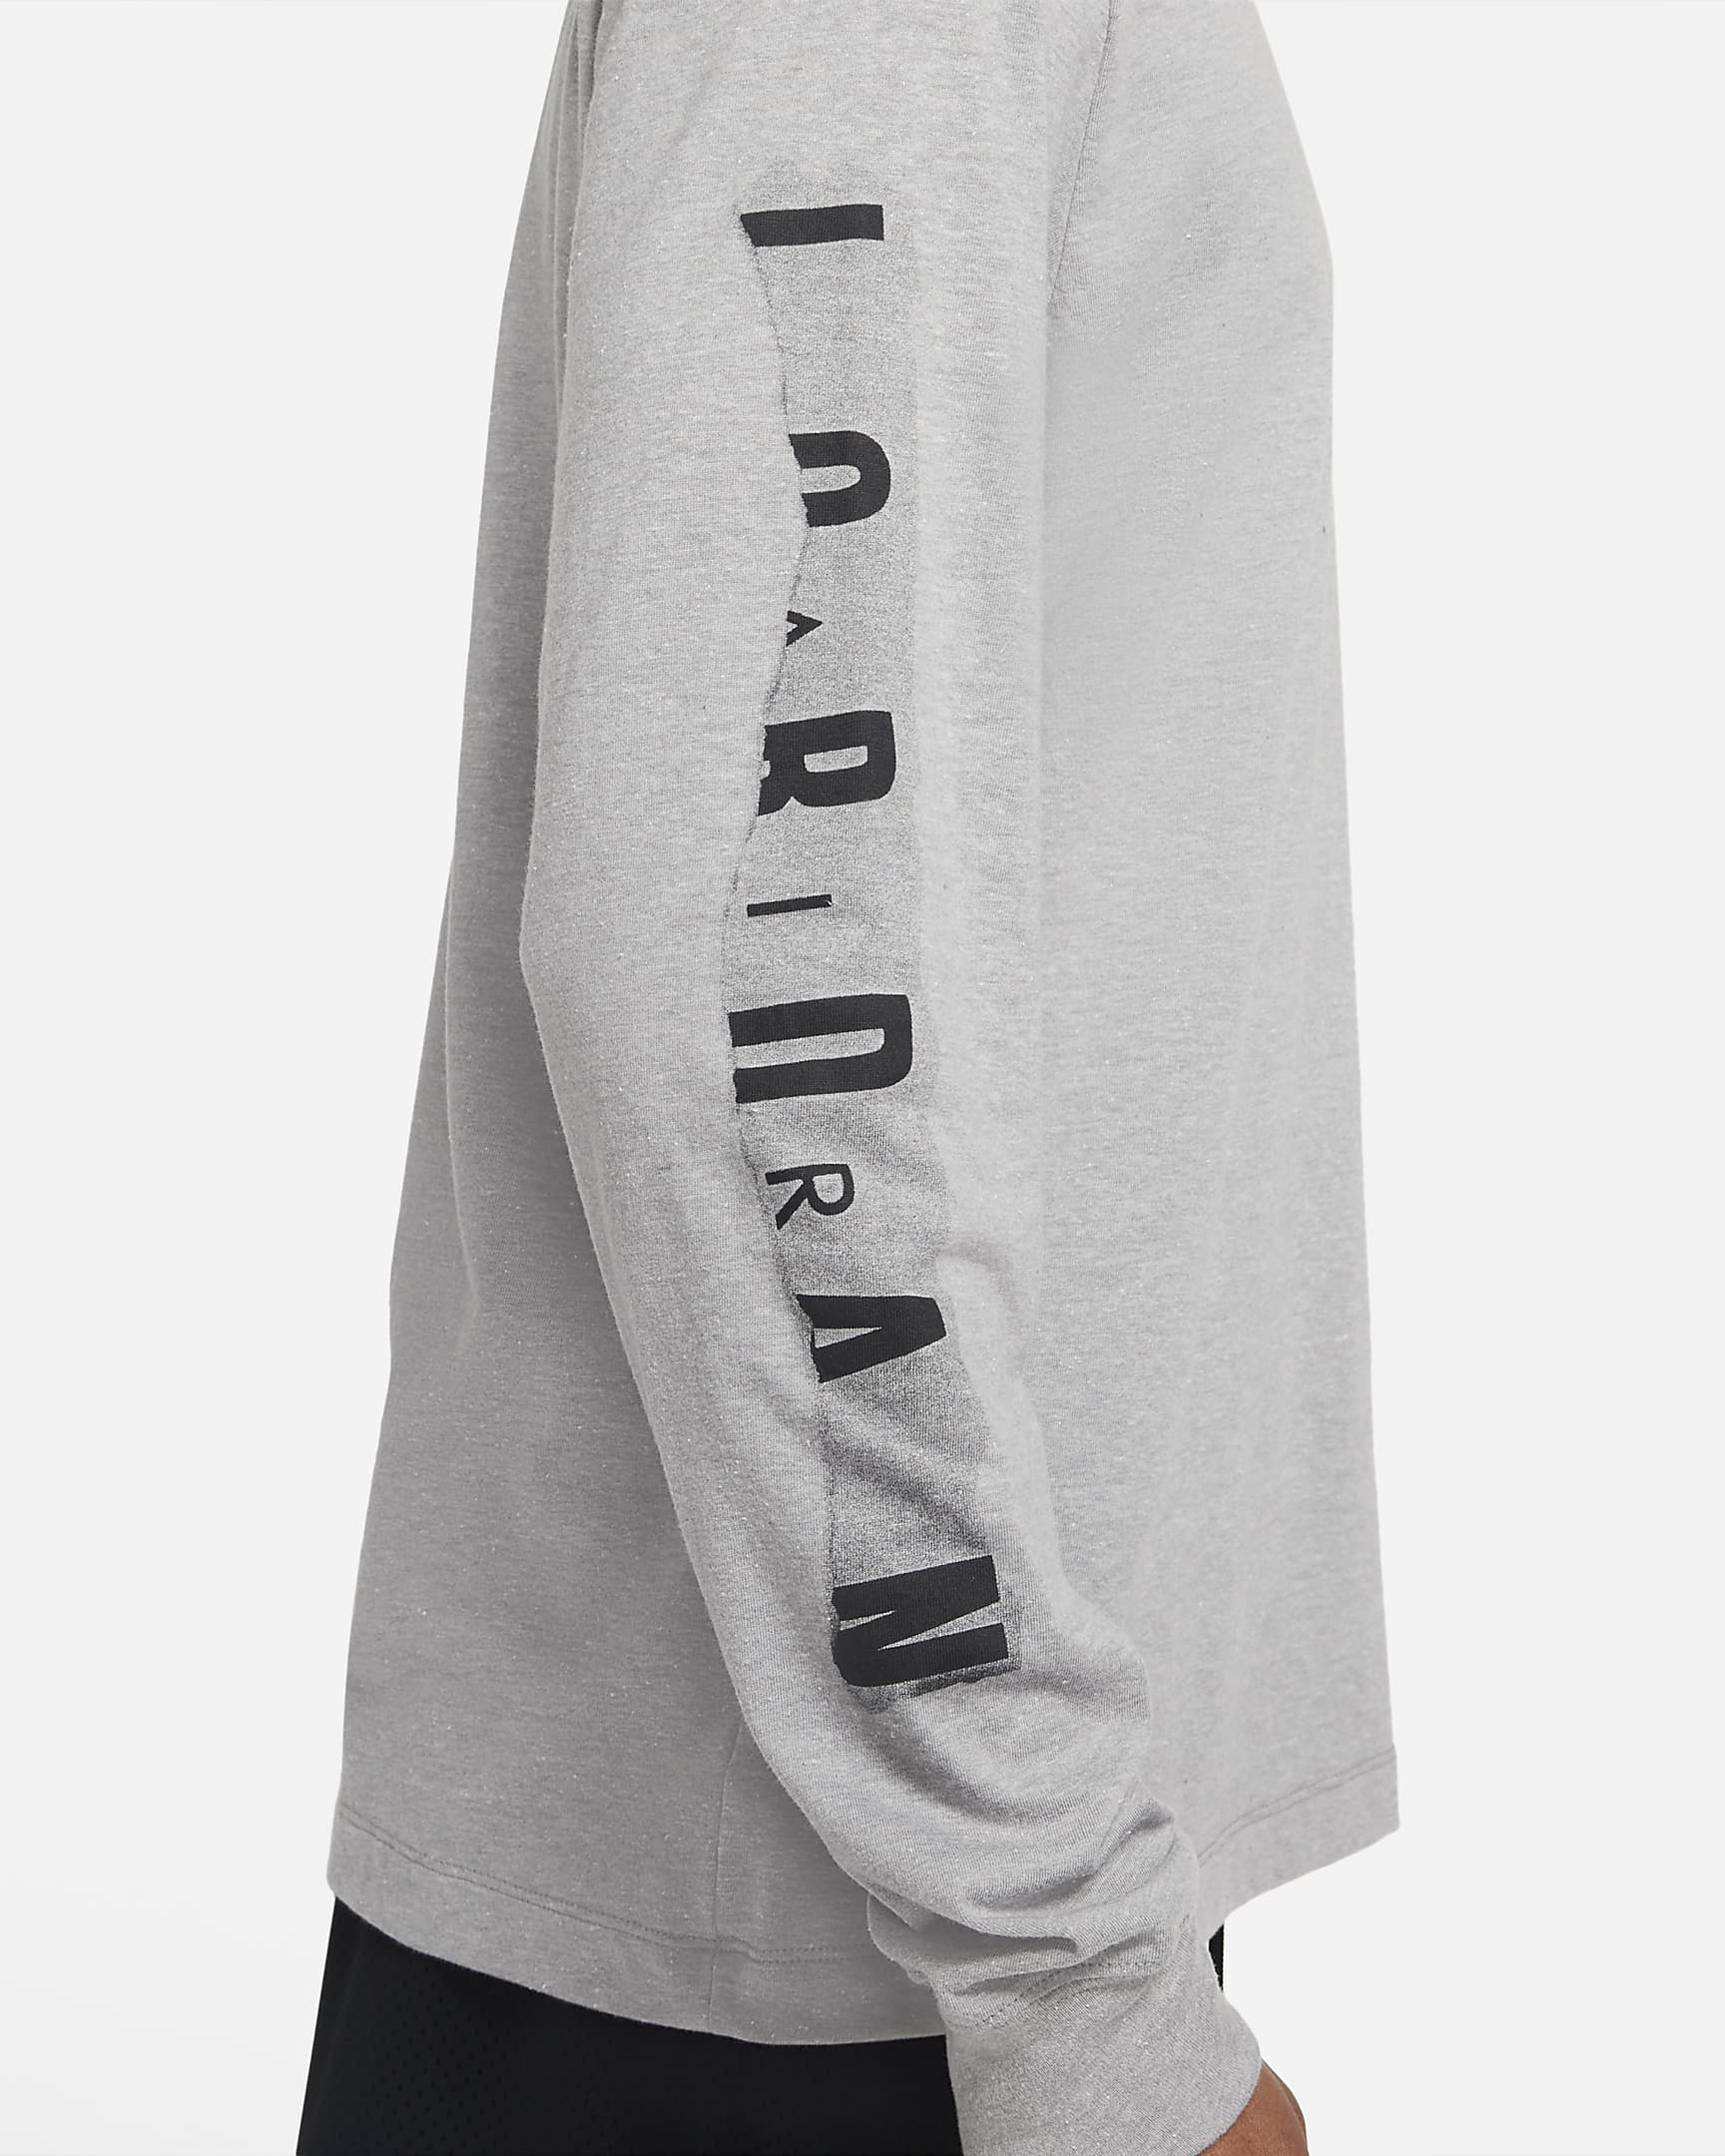 jordan-jumpman-mens-long-sleeve-t-shirt-2dMpXz-3.png